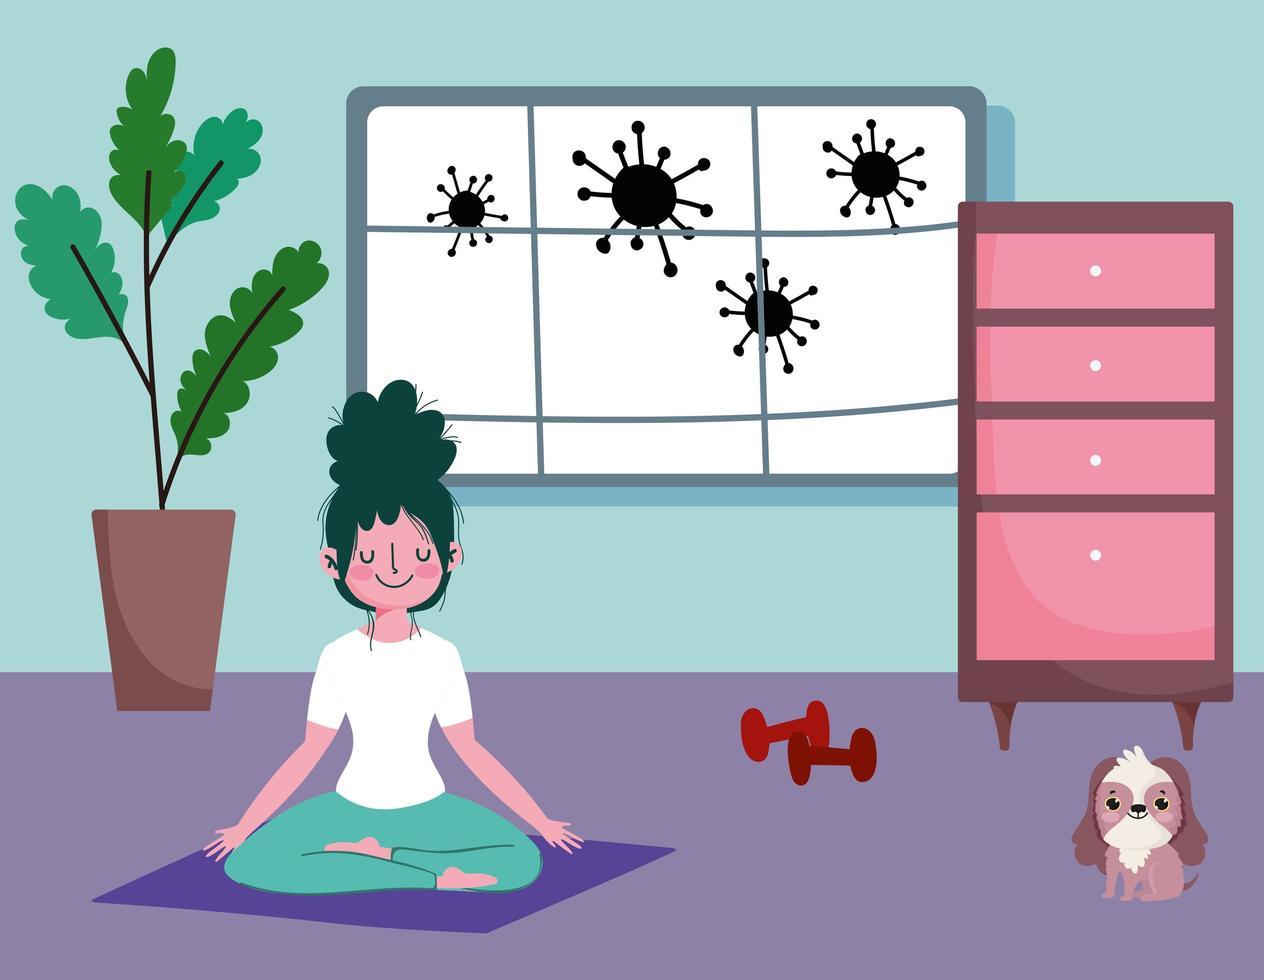 junge Frau macht Yoga zu Hause vektor